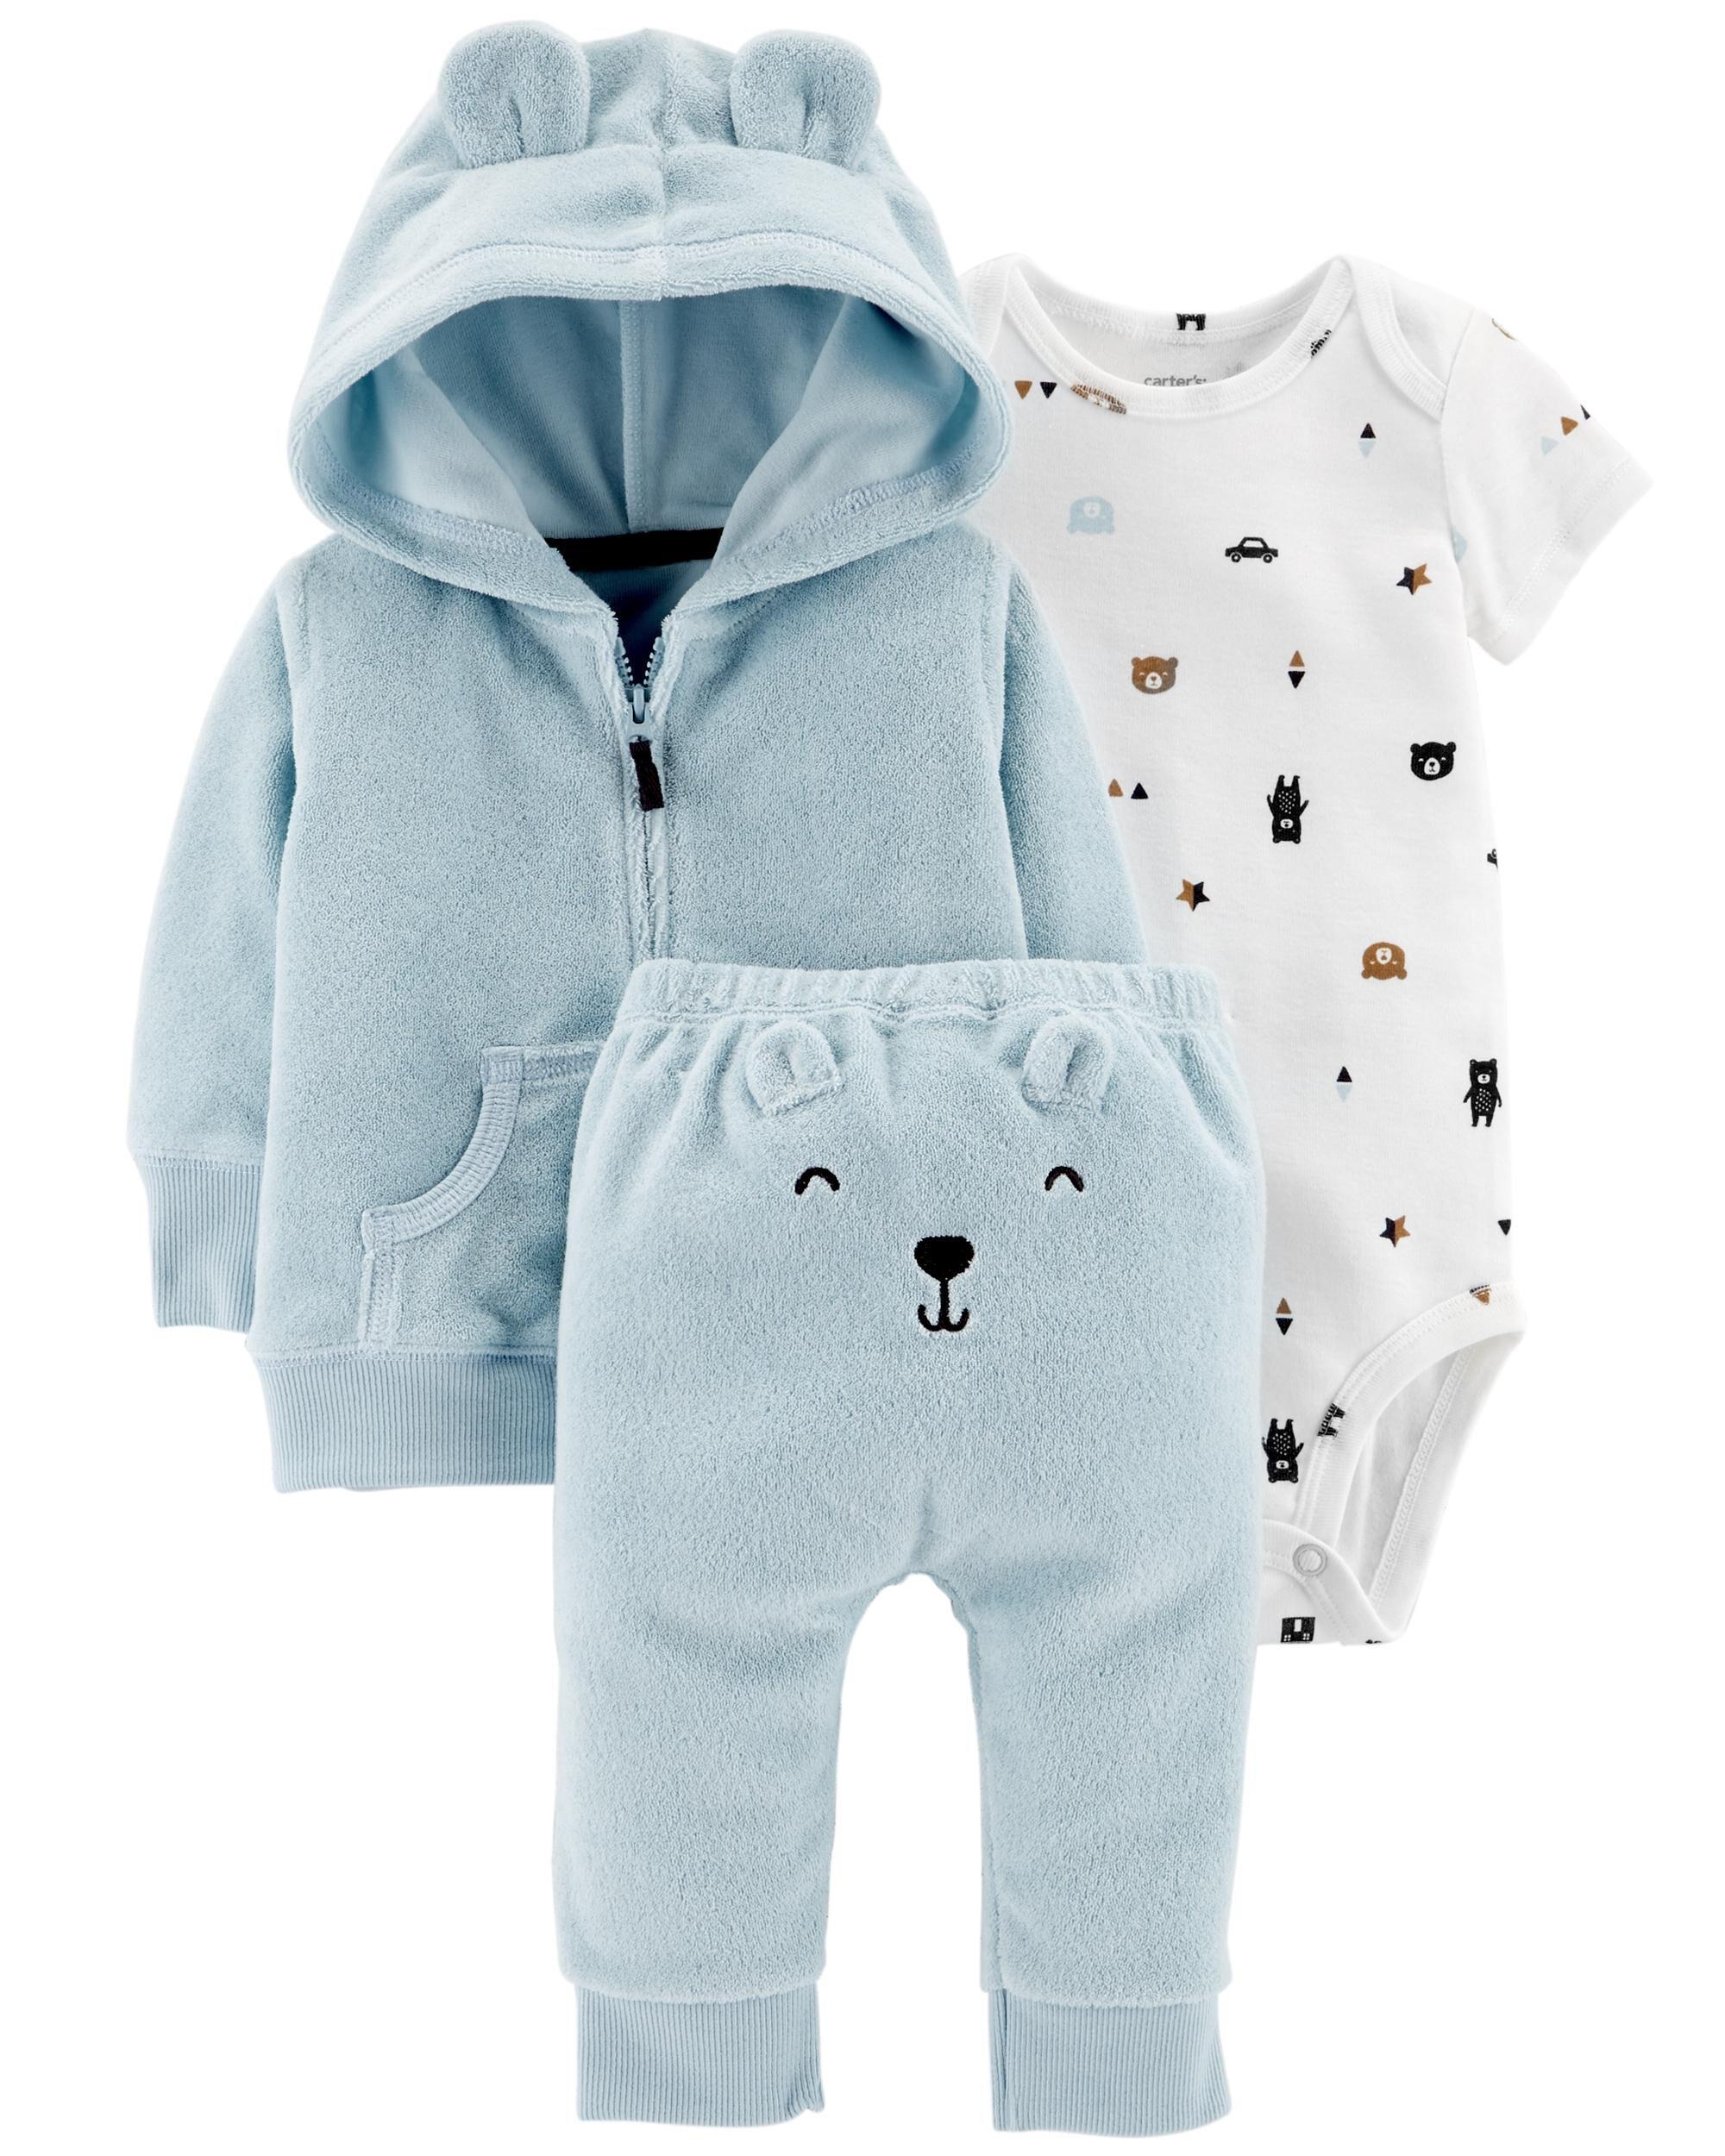 Carters Baby Boy Clothes 12 Months Bodysuit /& Terry Pants Set Outfit Blue